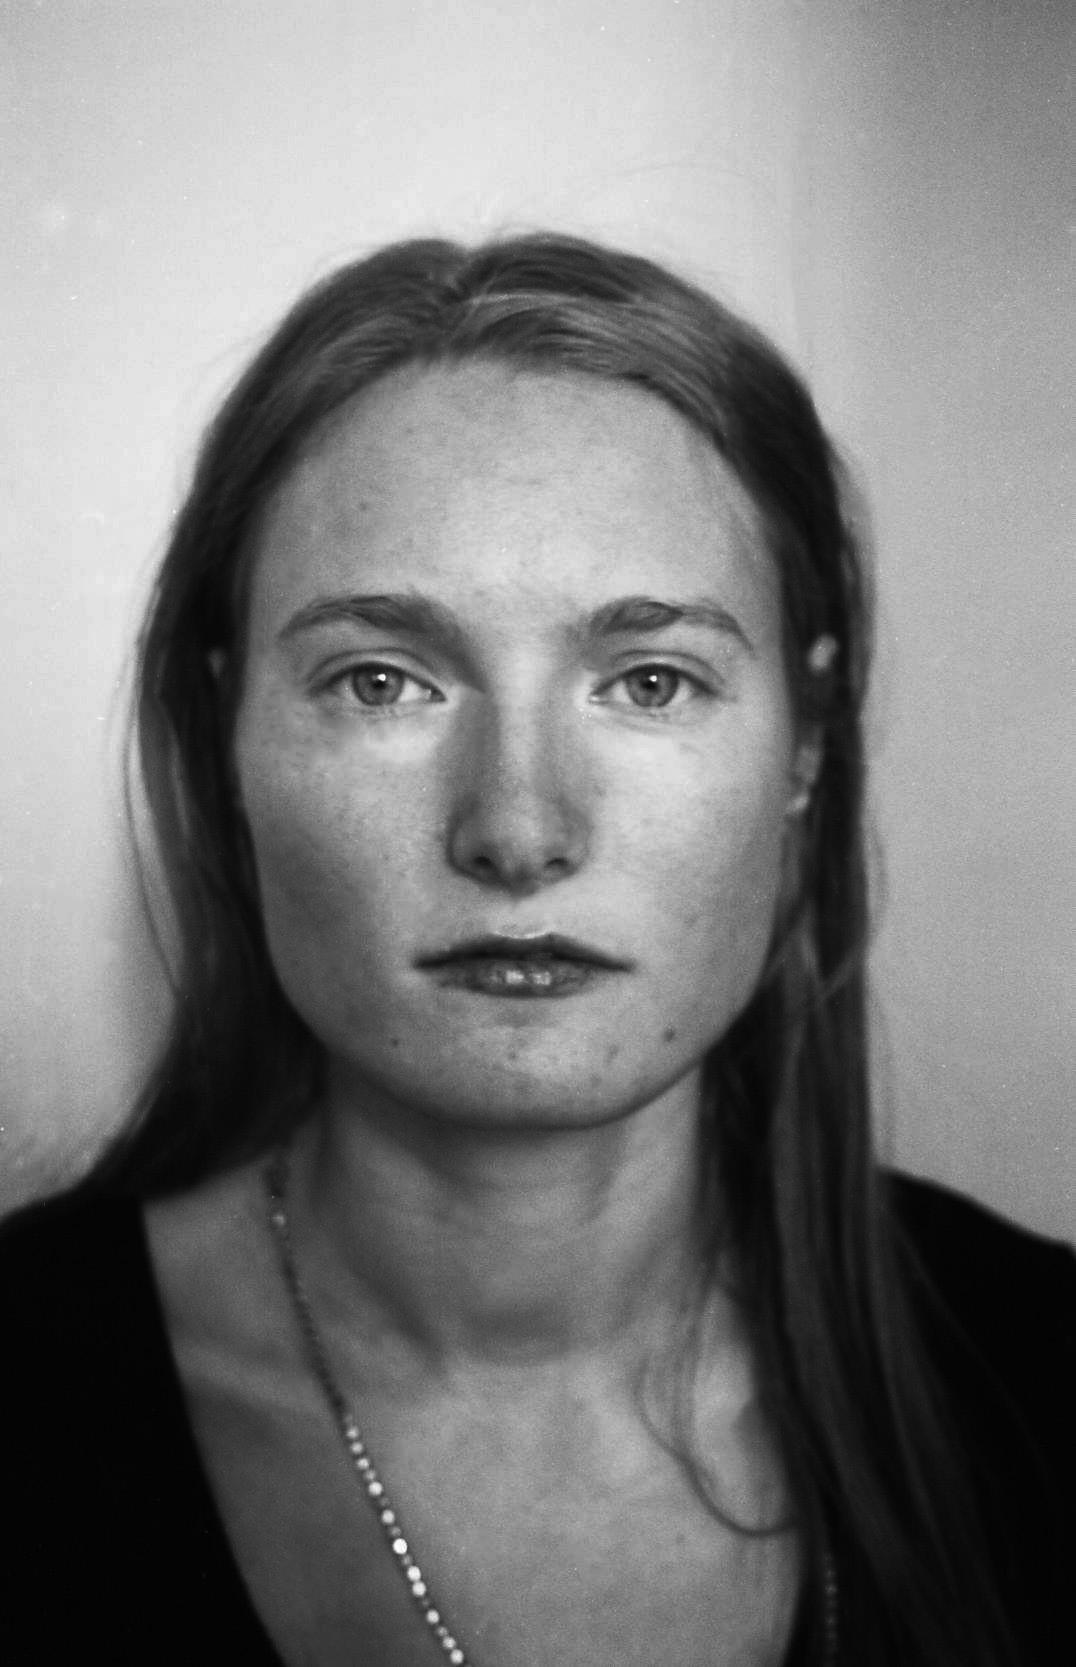 Lea Brinon, Rachel, Film, 29 x 42 cm, SOLD  All rights reserved